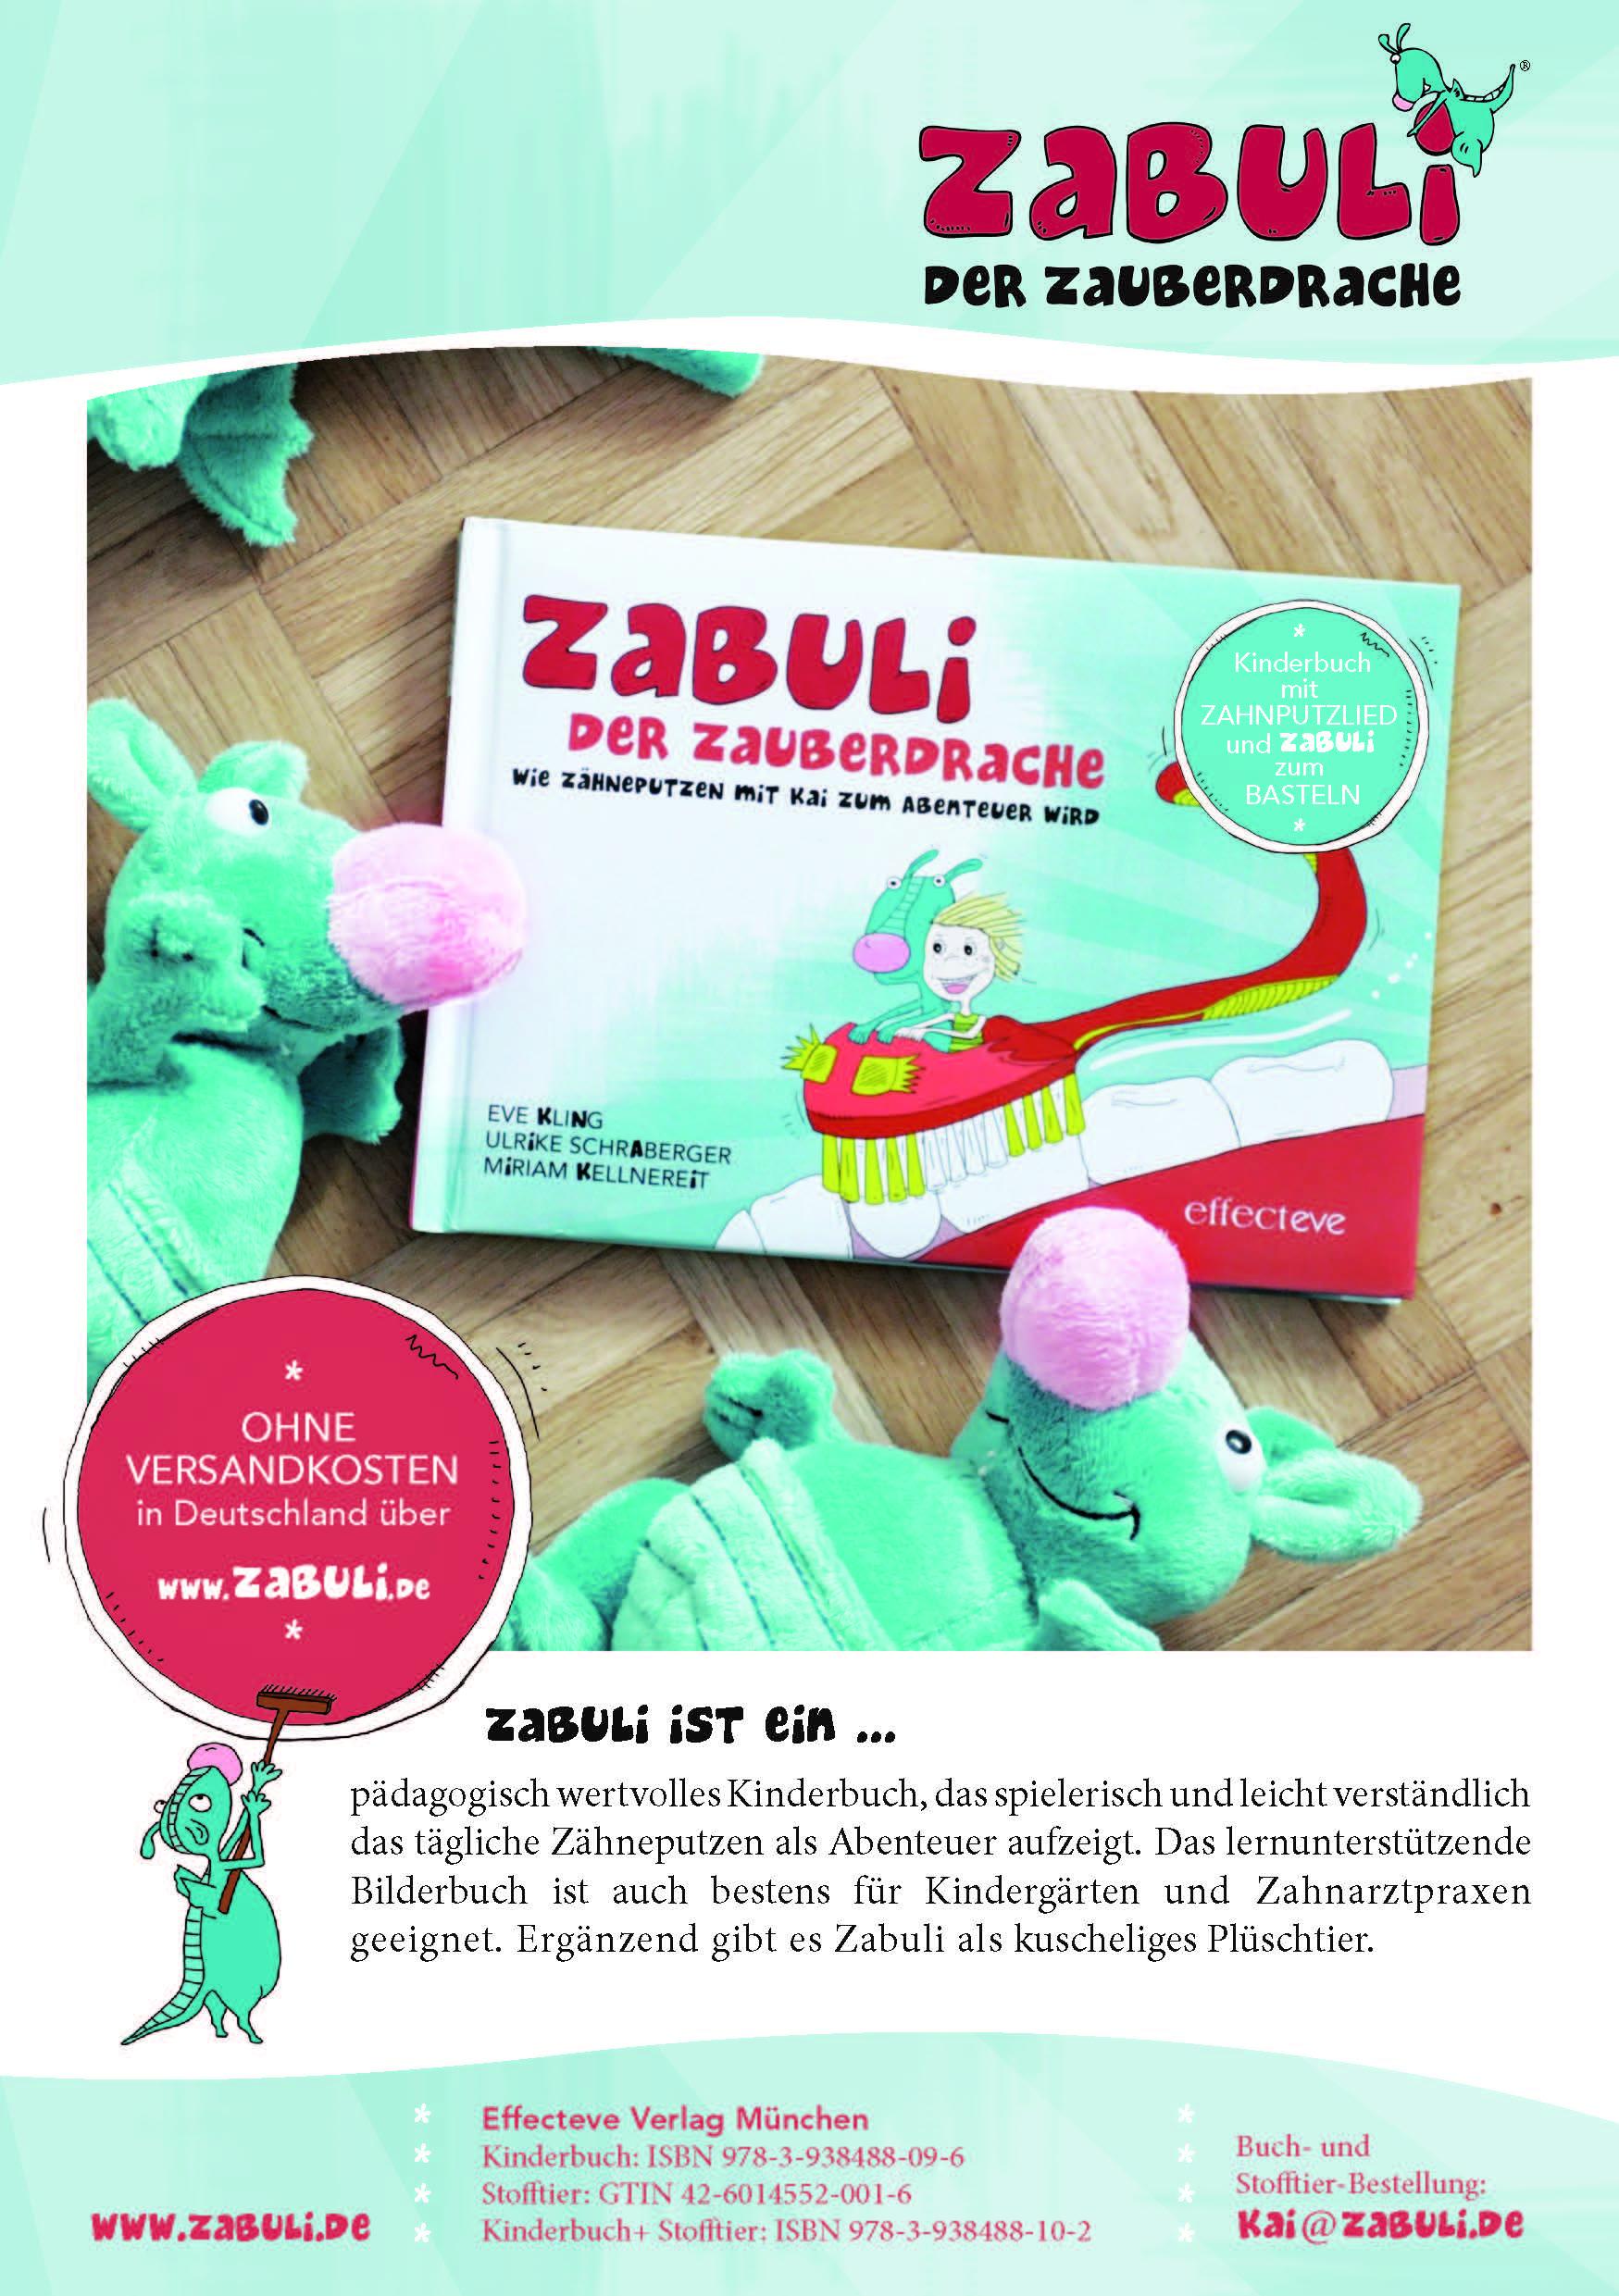 Zabuli_gr_Zauberdrache_Kinderbuch_Stofftier_EffecteveVerlag_EveKling.jpg